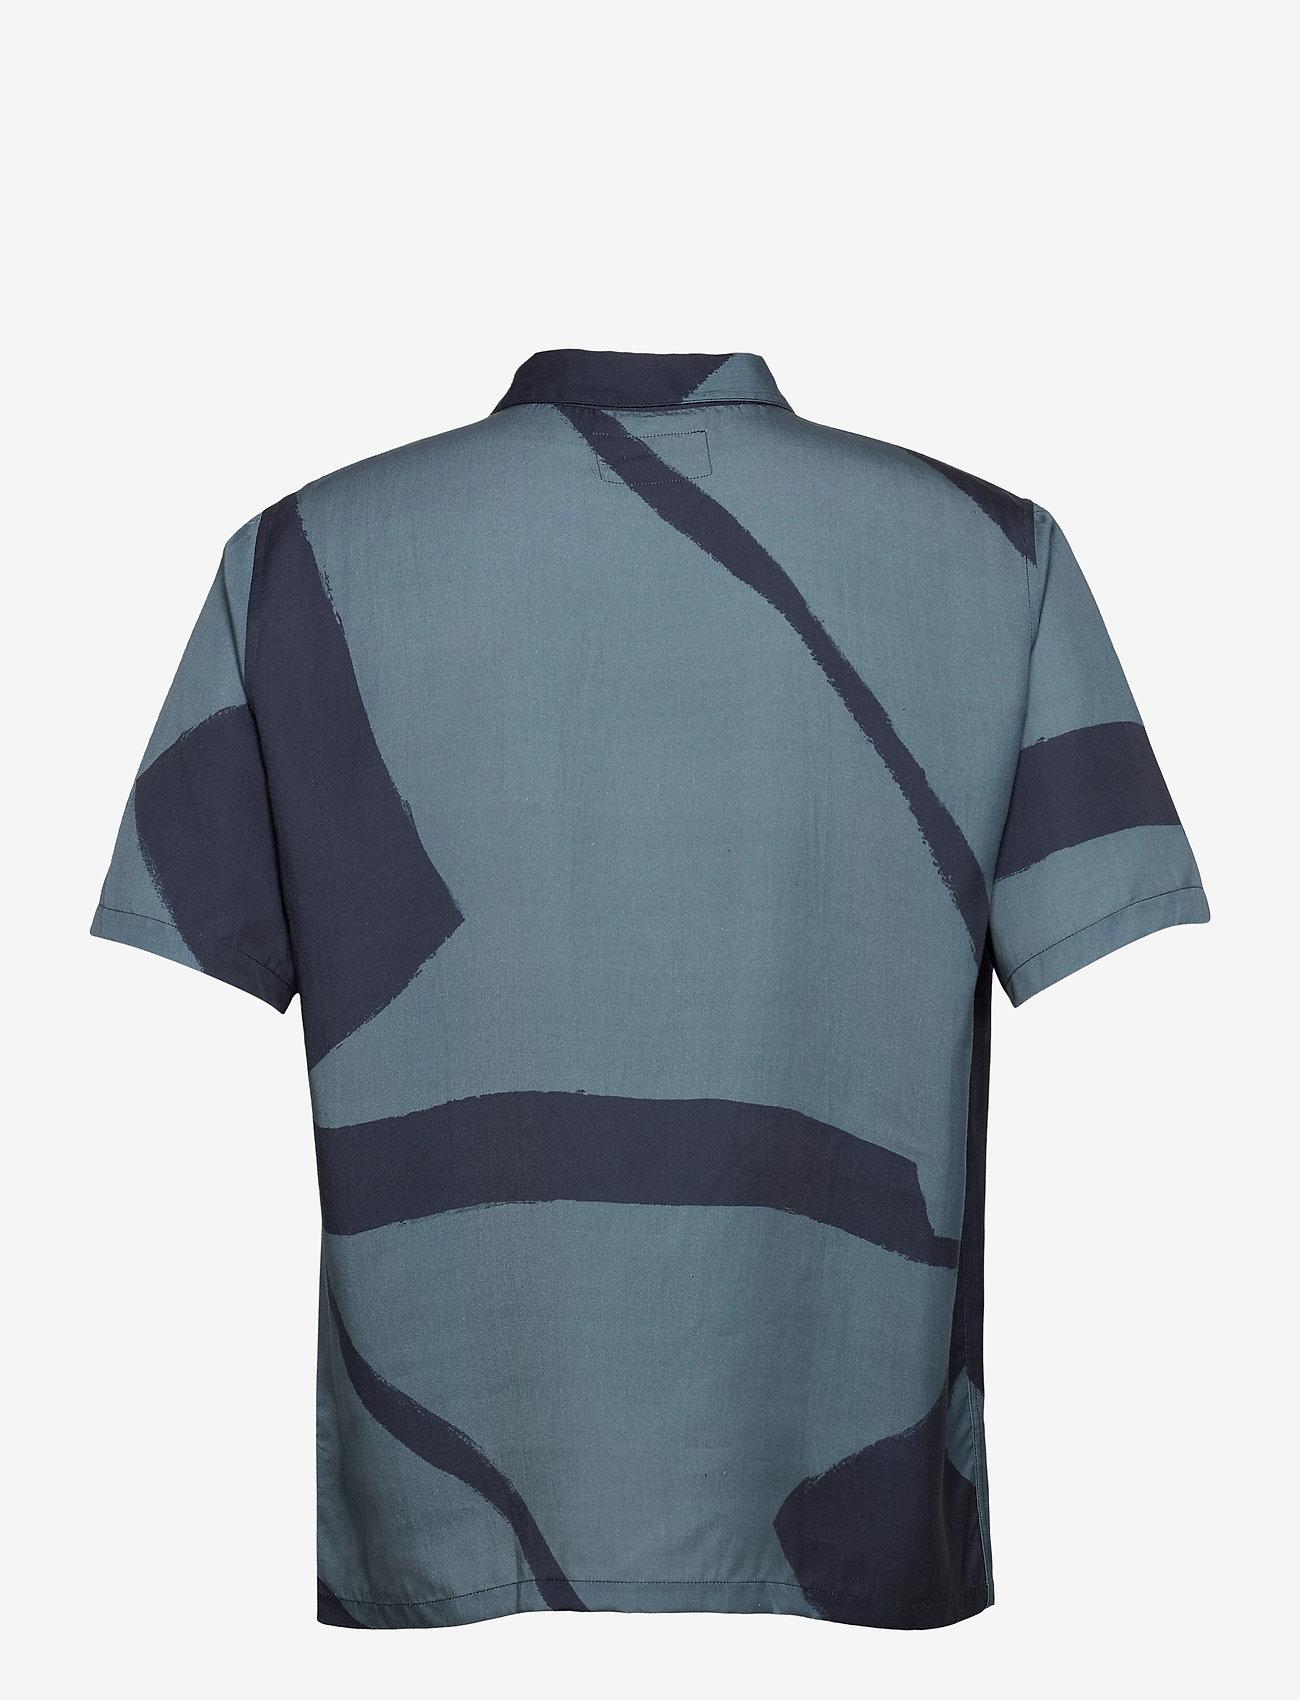 Folk - GABE SHIRT - chemises à manches courtes - border print navy - 1